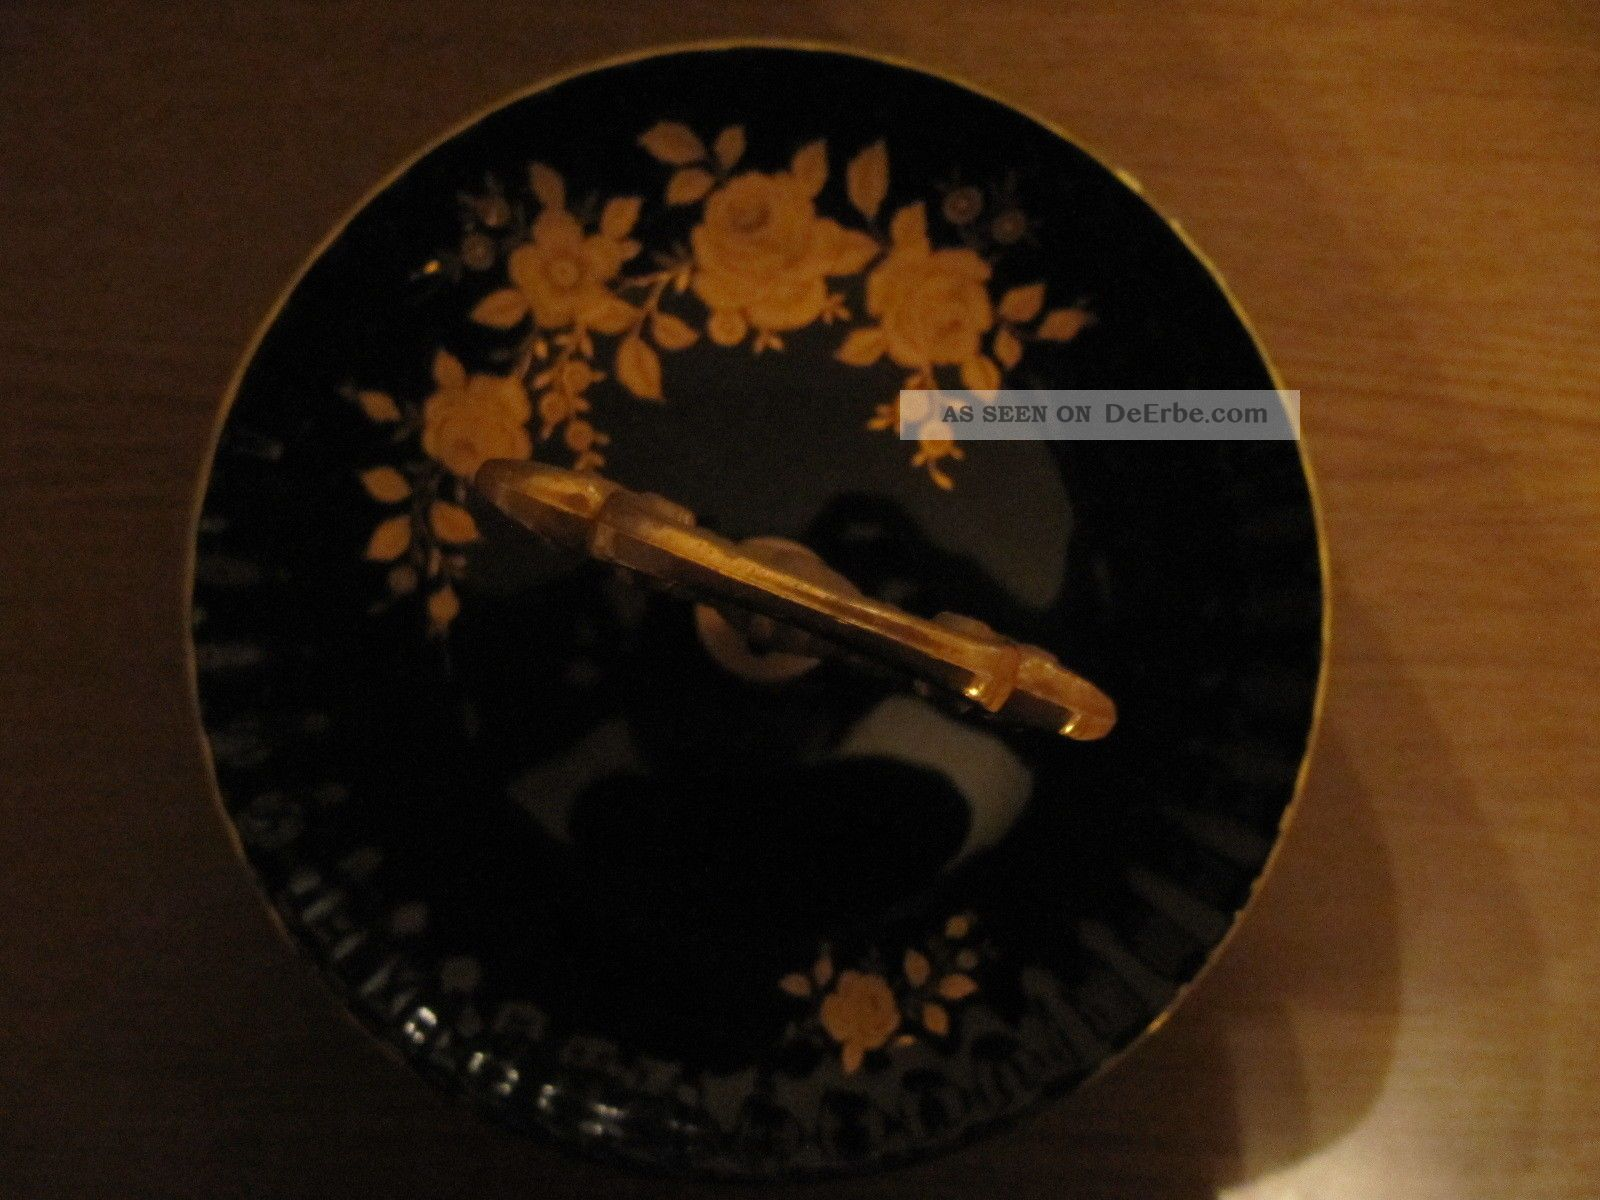 etagere kobalt blau 24 karat gold made in germany wunsiedel. Black Bedroom Furniture Sets. Home Design Ideas